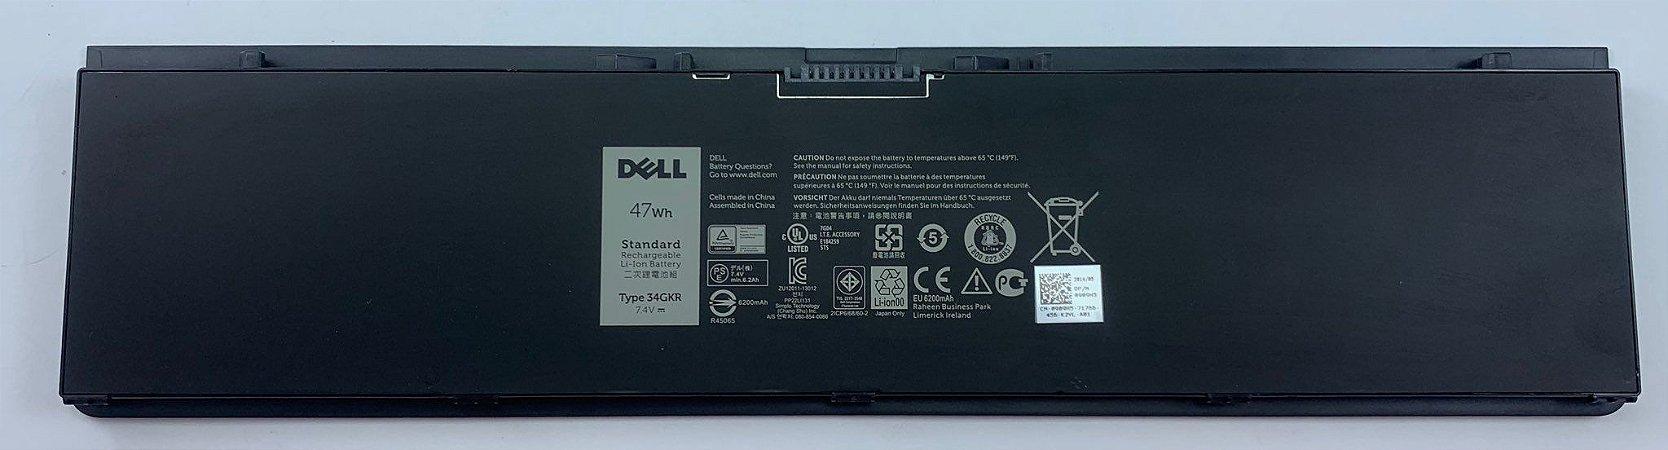 Bateria 34gkr Para Dell Latitude E7450 E7250